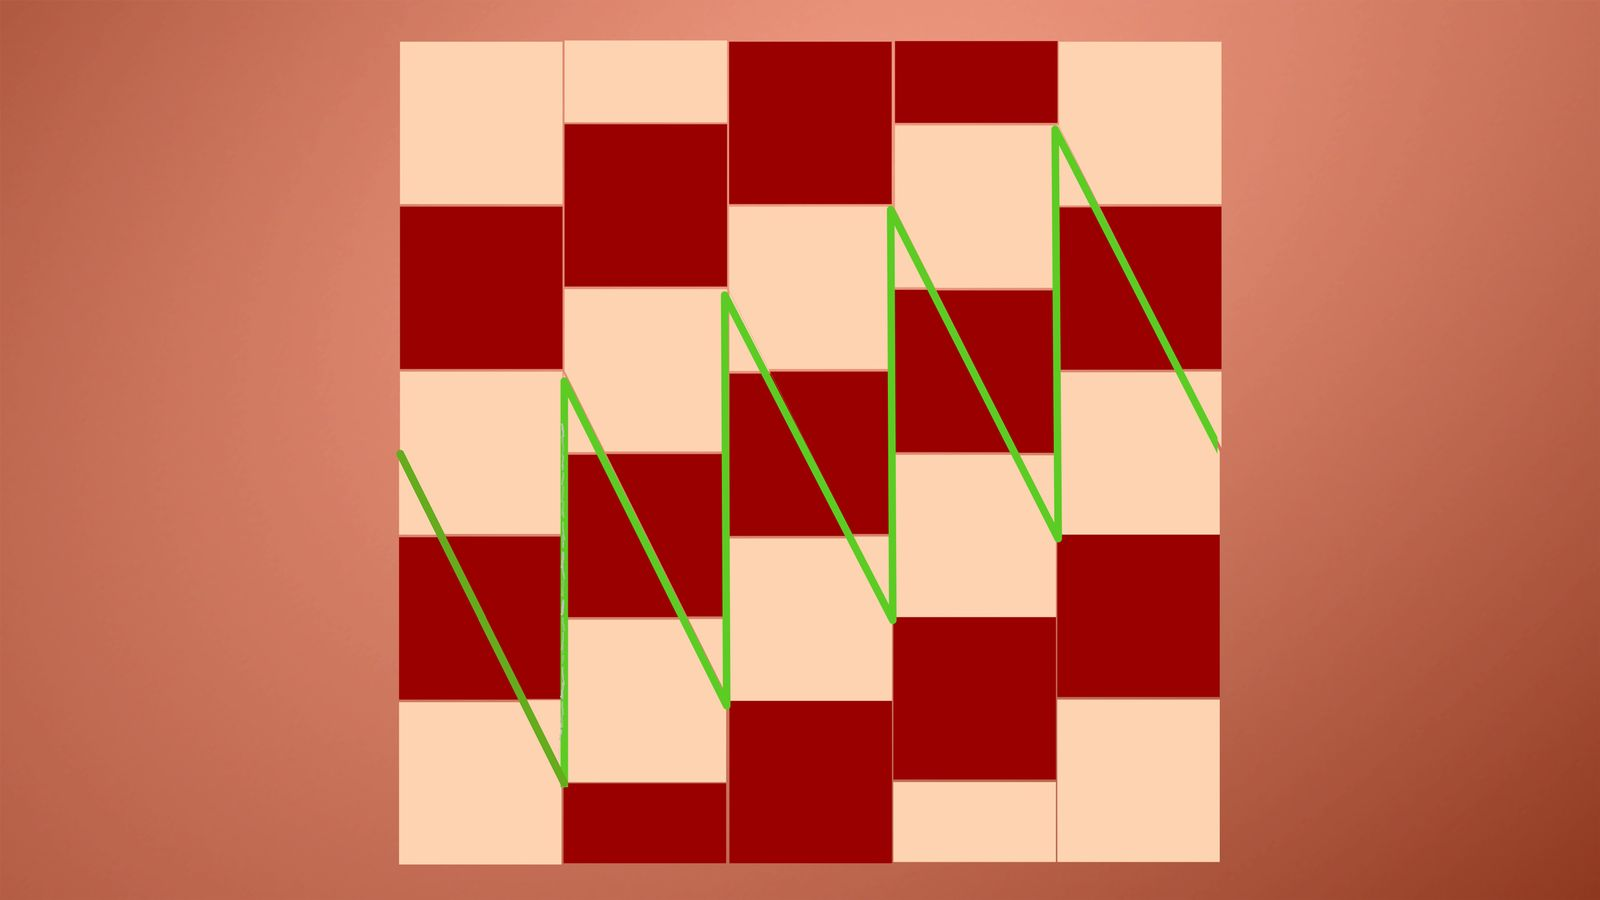 rdw-teppich-loesung-2-108.4.21